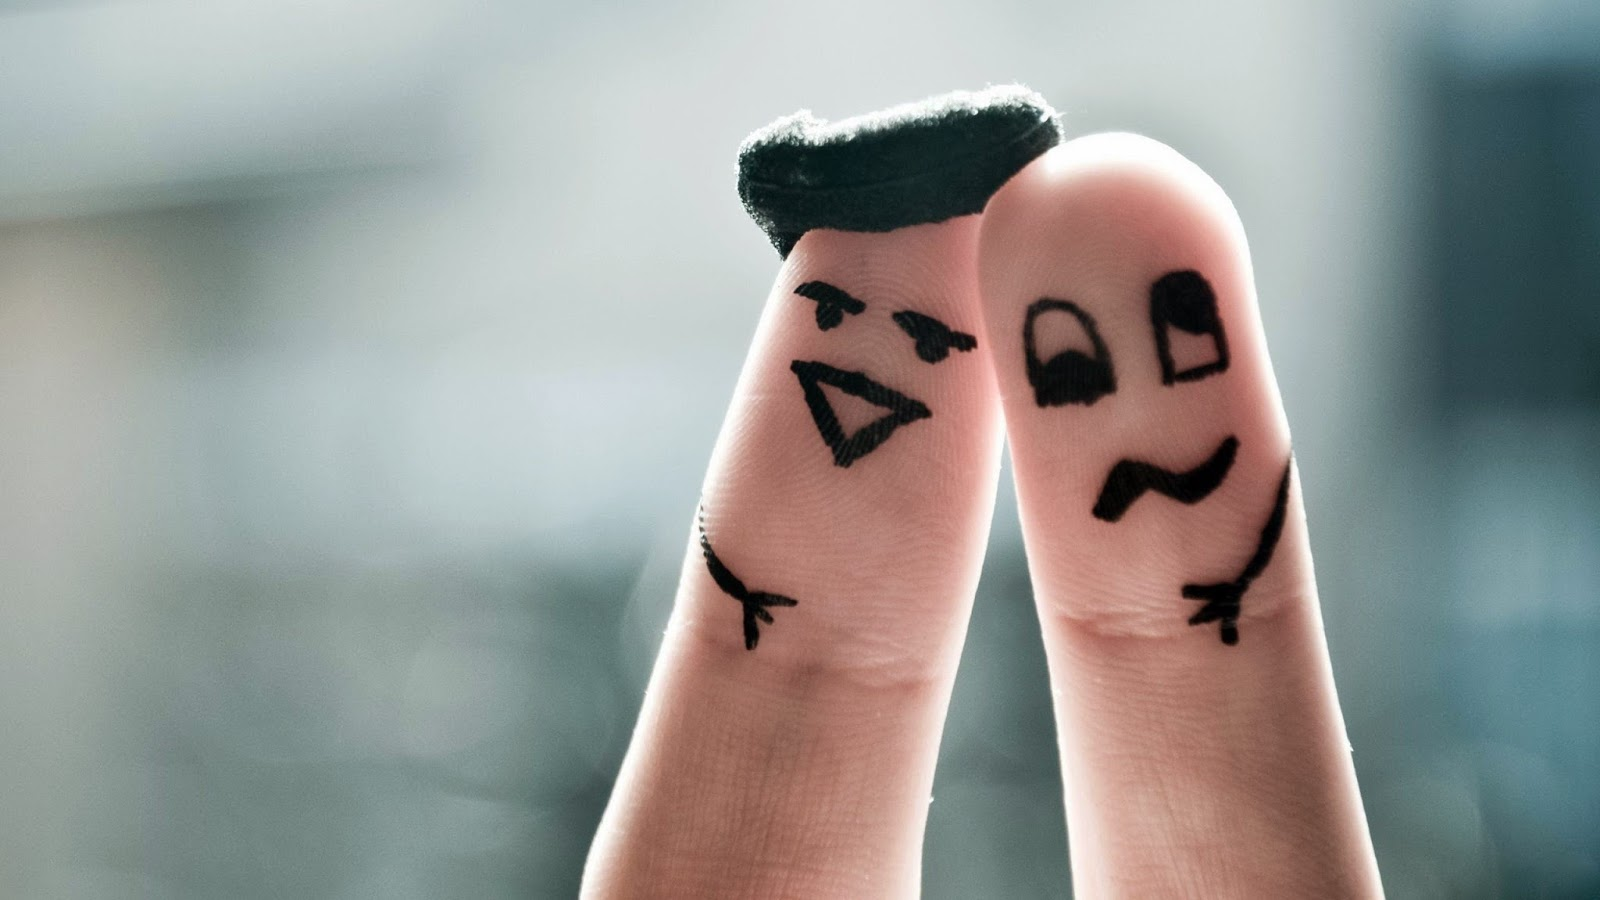 Finger Faces Three by Pete-Wentz-I-Love on DeviantArt